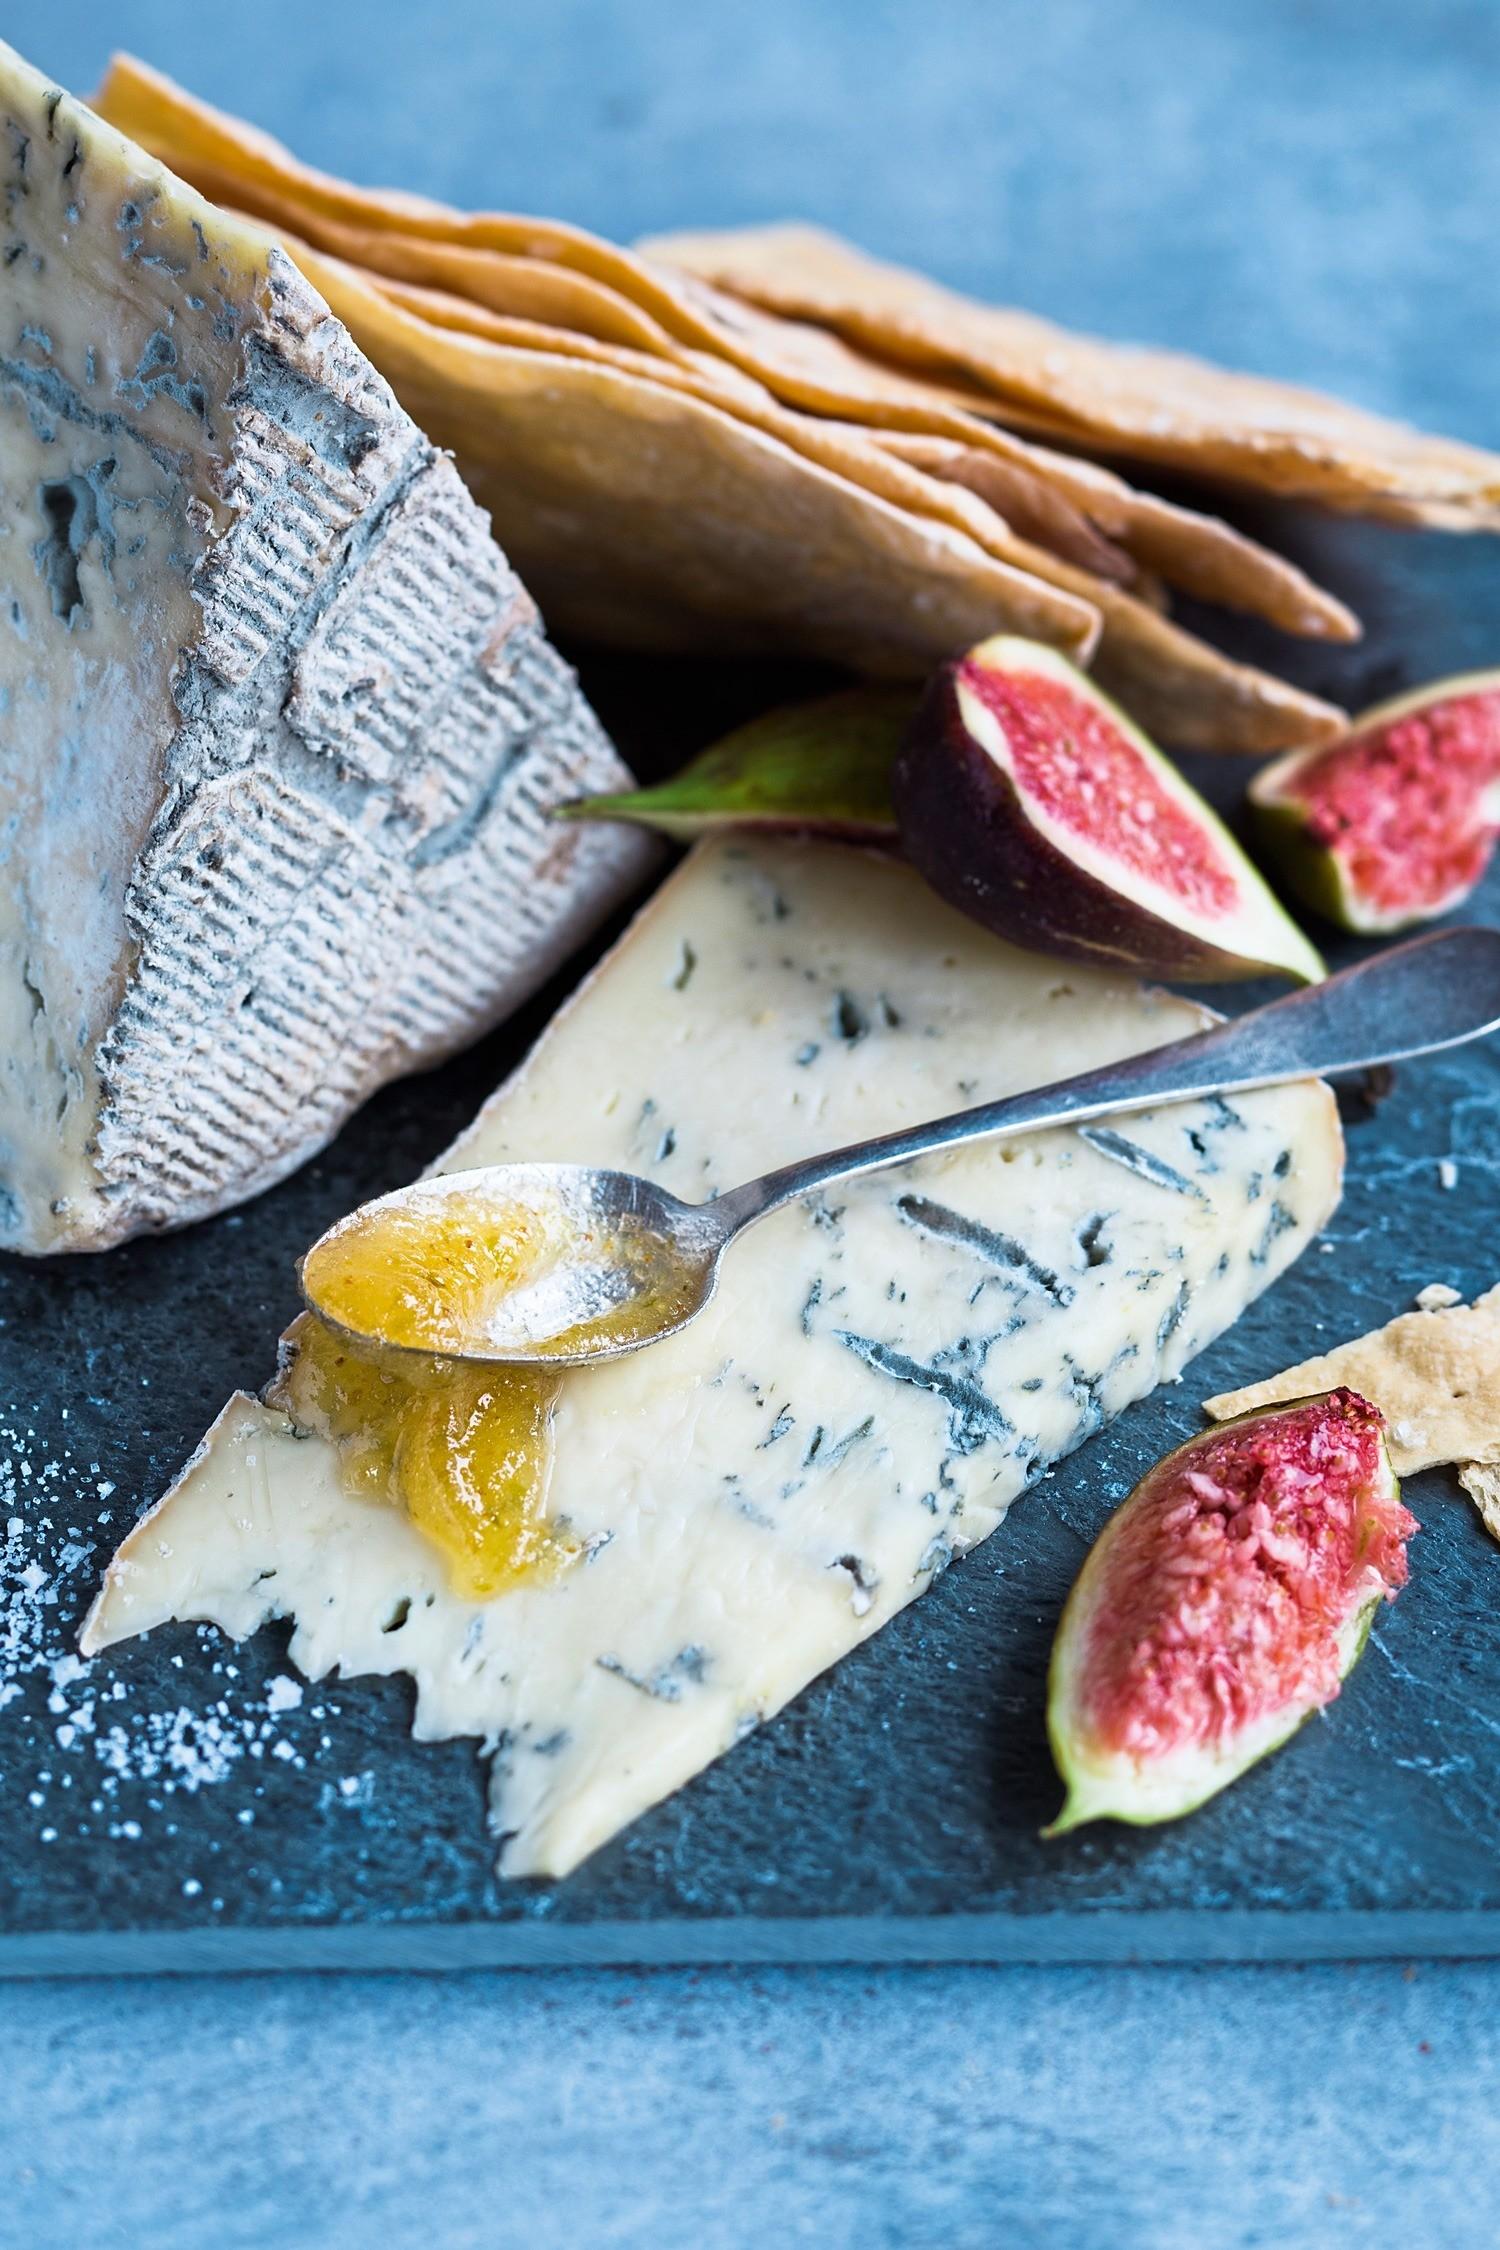 Чем полезен сыр с плесенью (эстеты оценят)